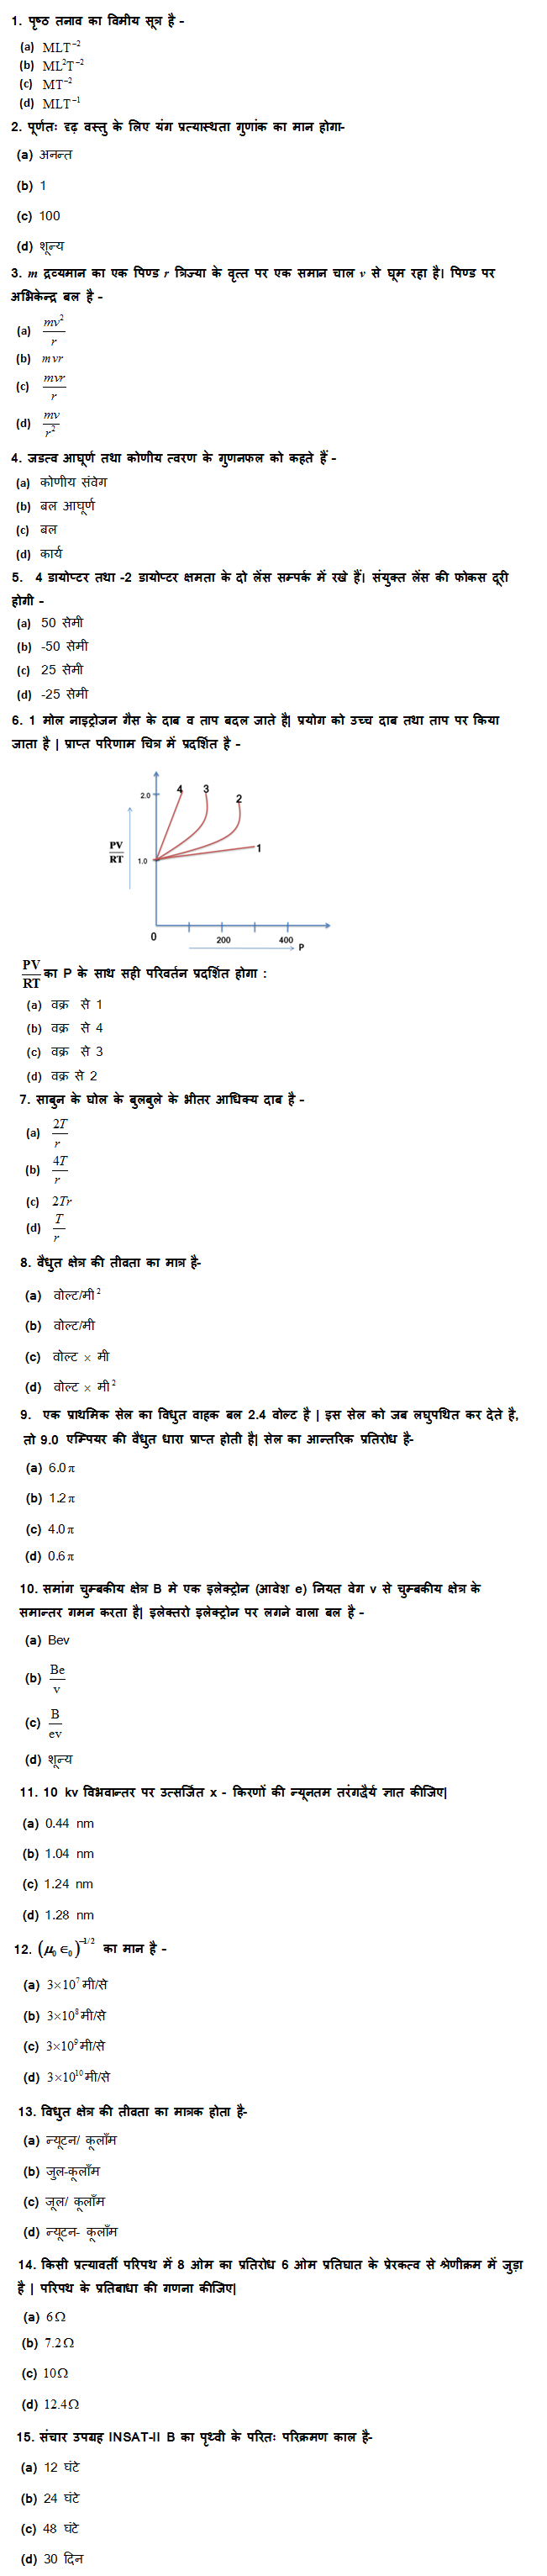 UP Board Class 12th Physics MCQ Test Set: 1 9